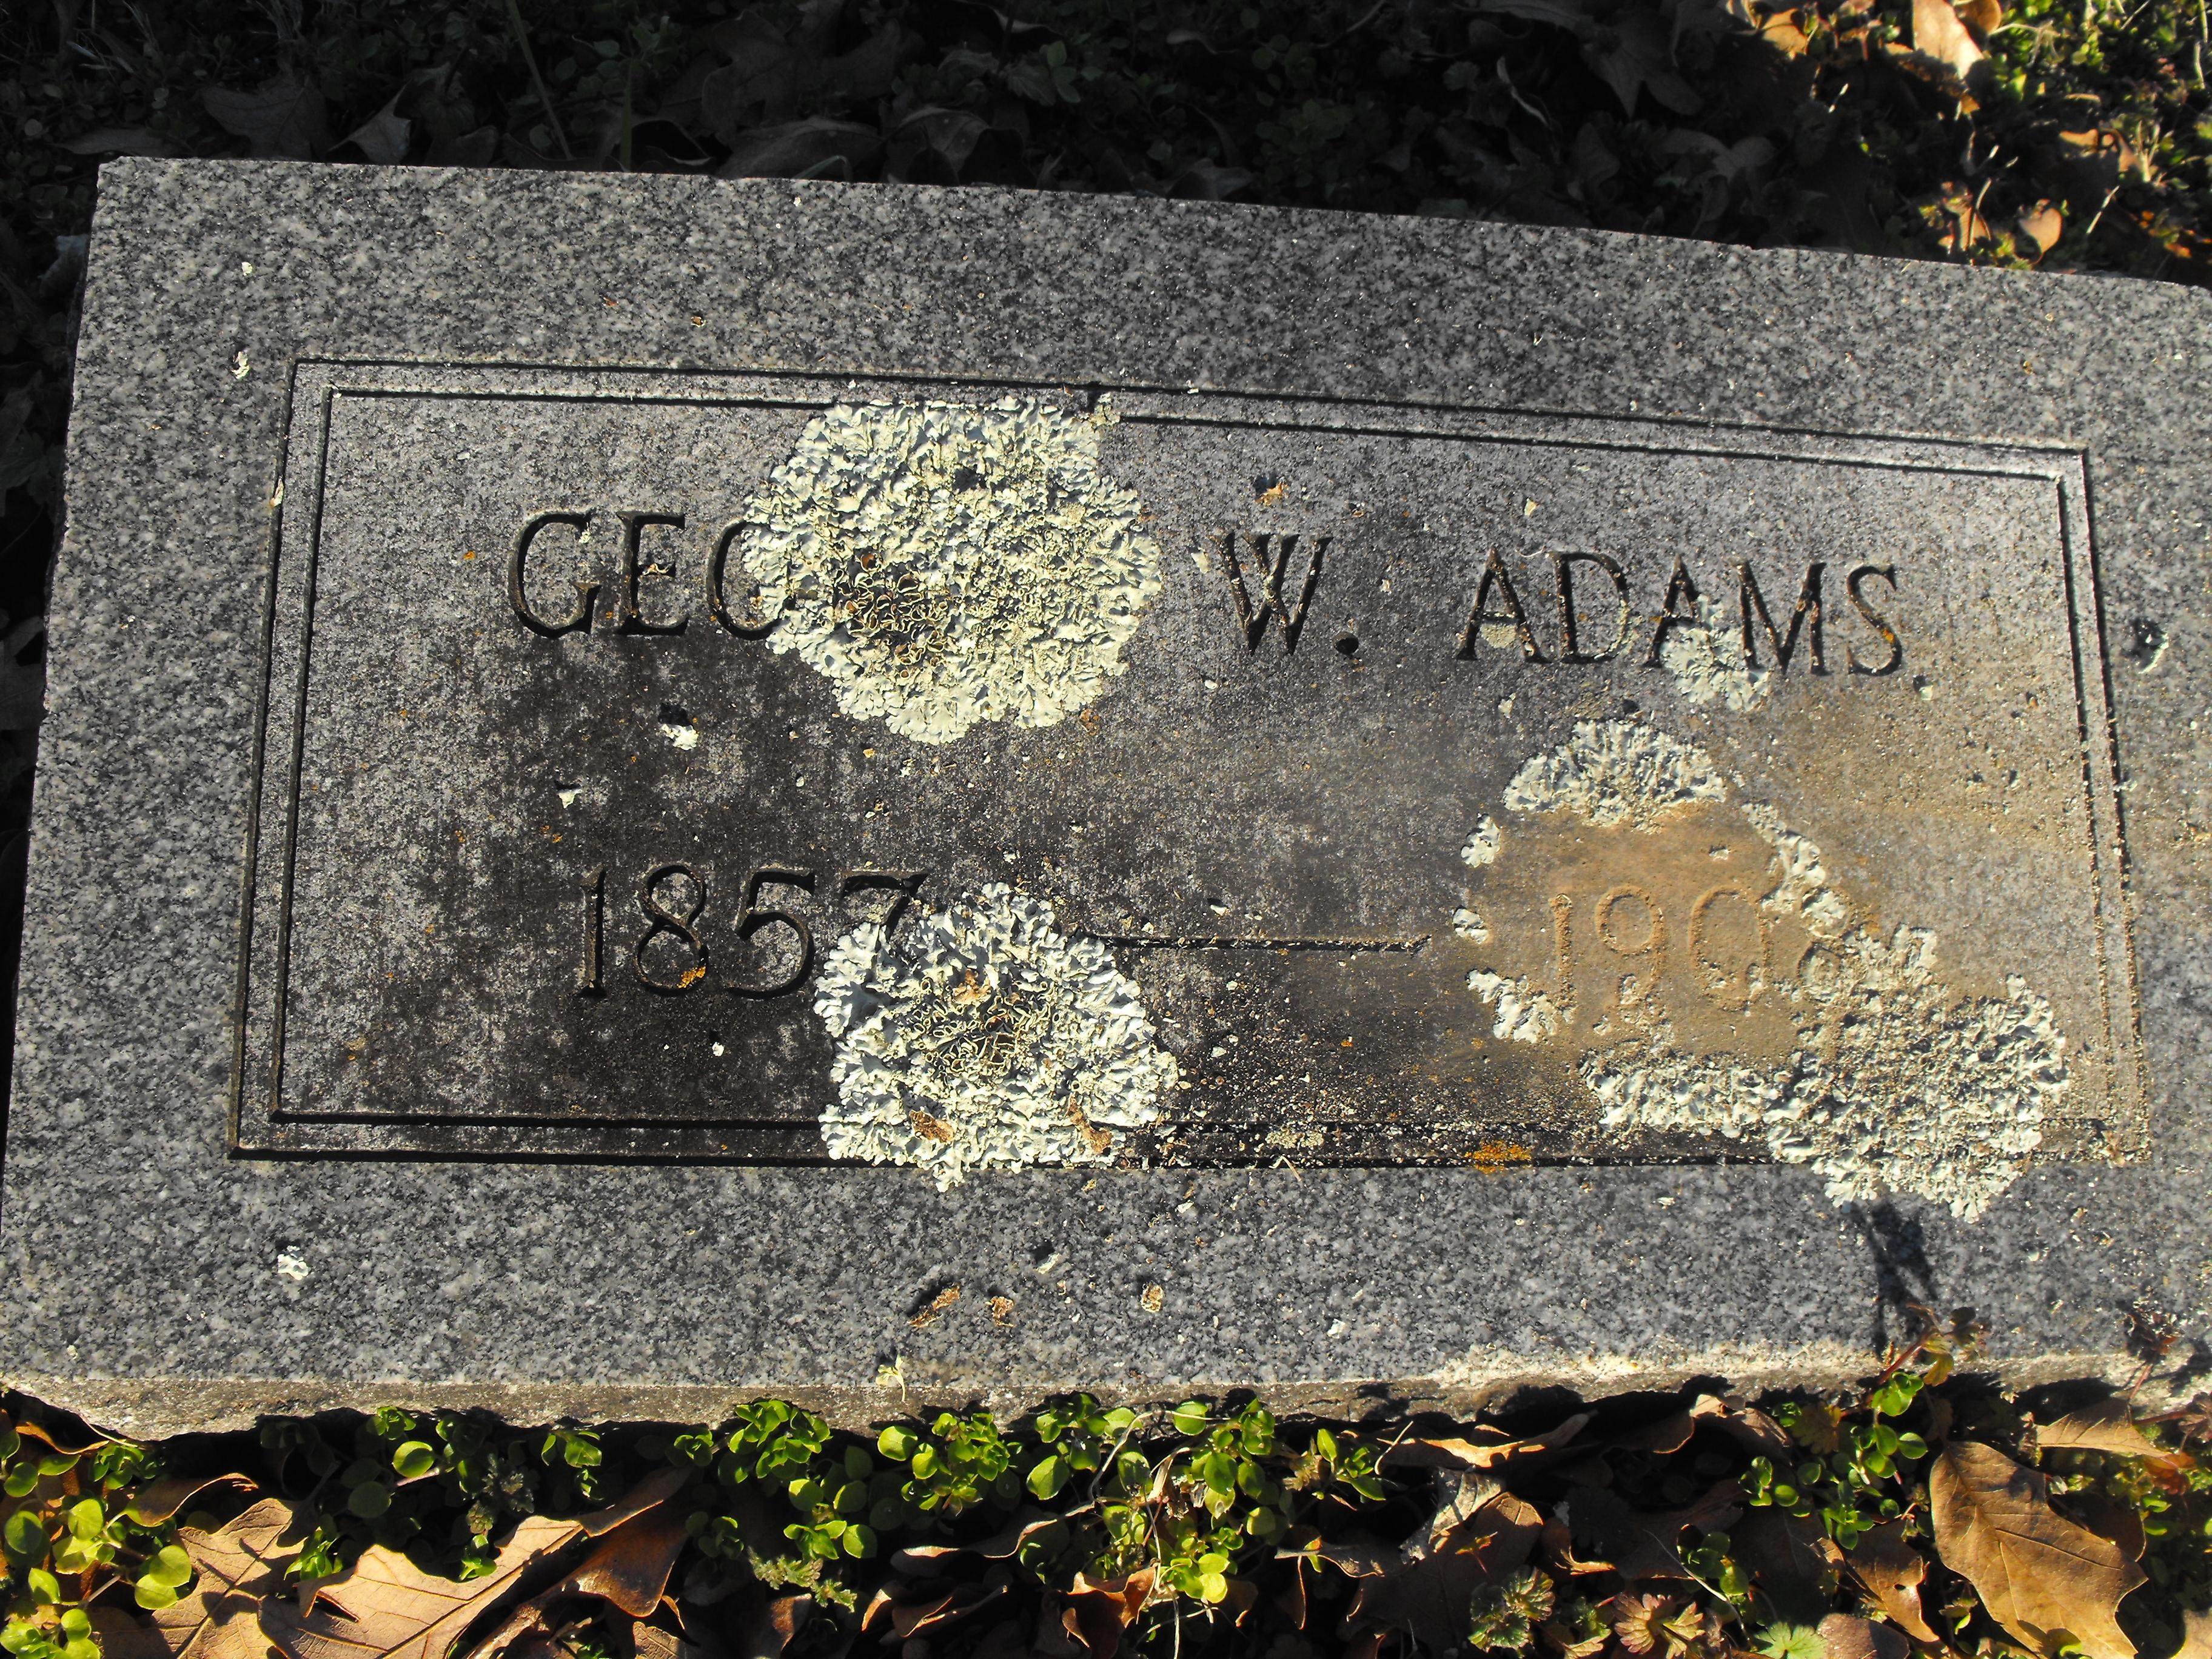 George W. Adams